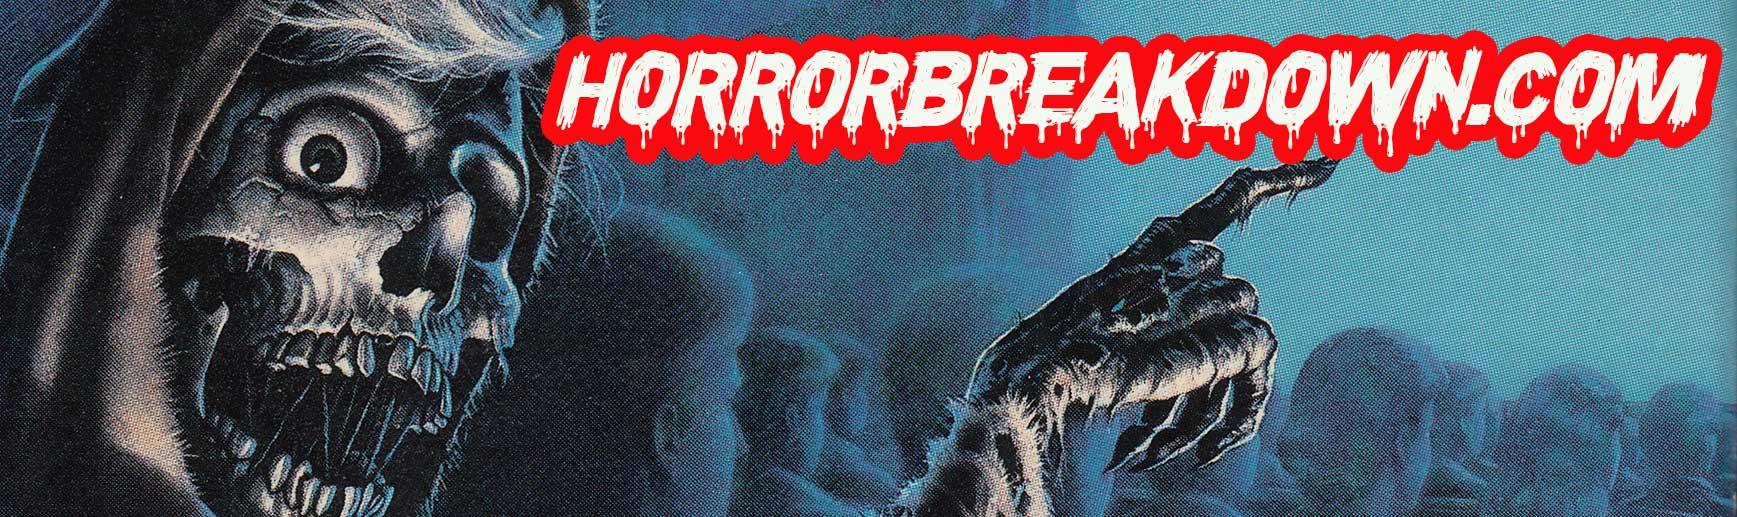 HorrorBreakdown.com